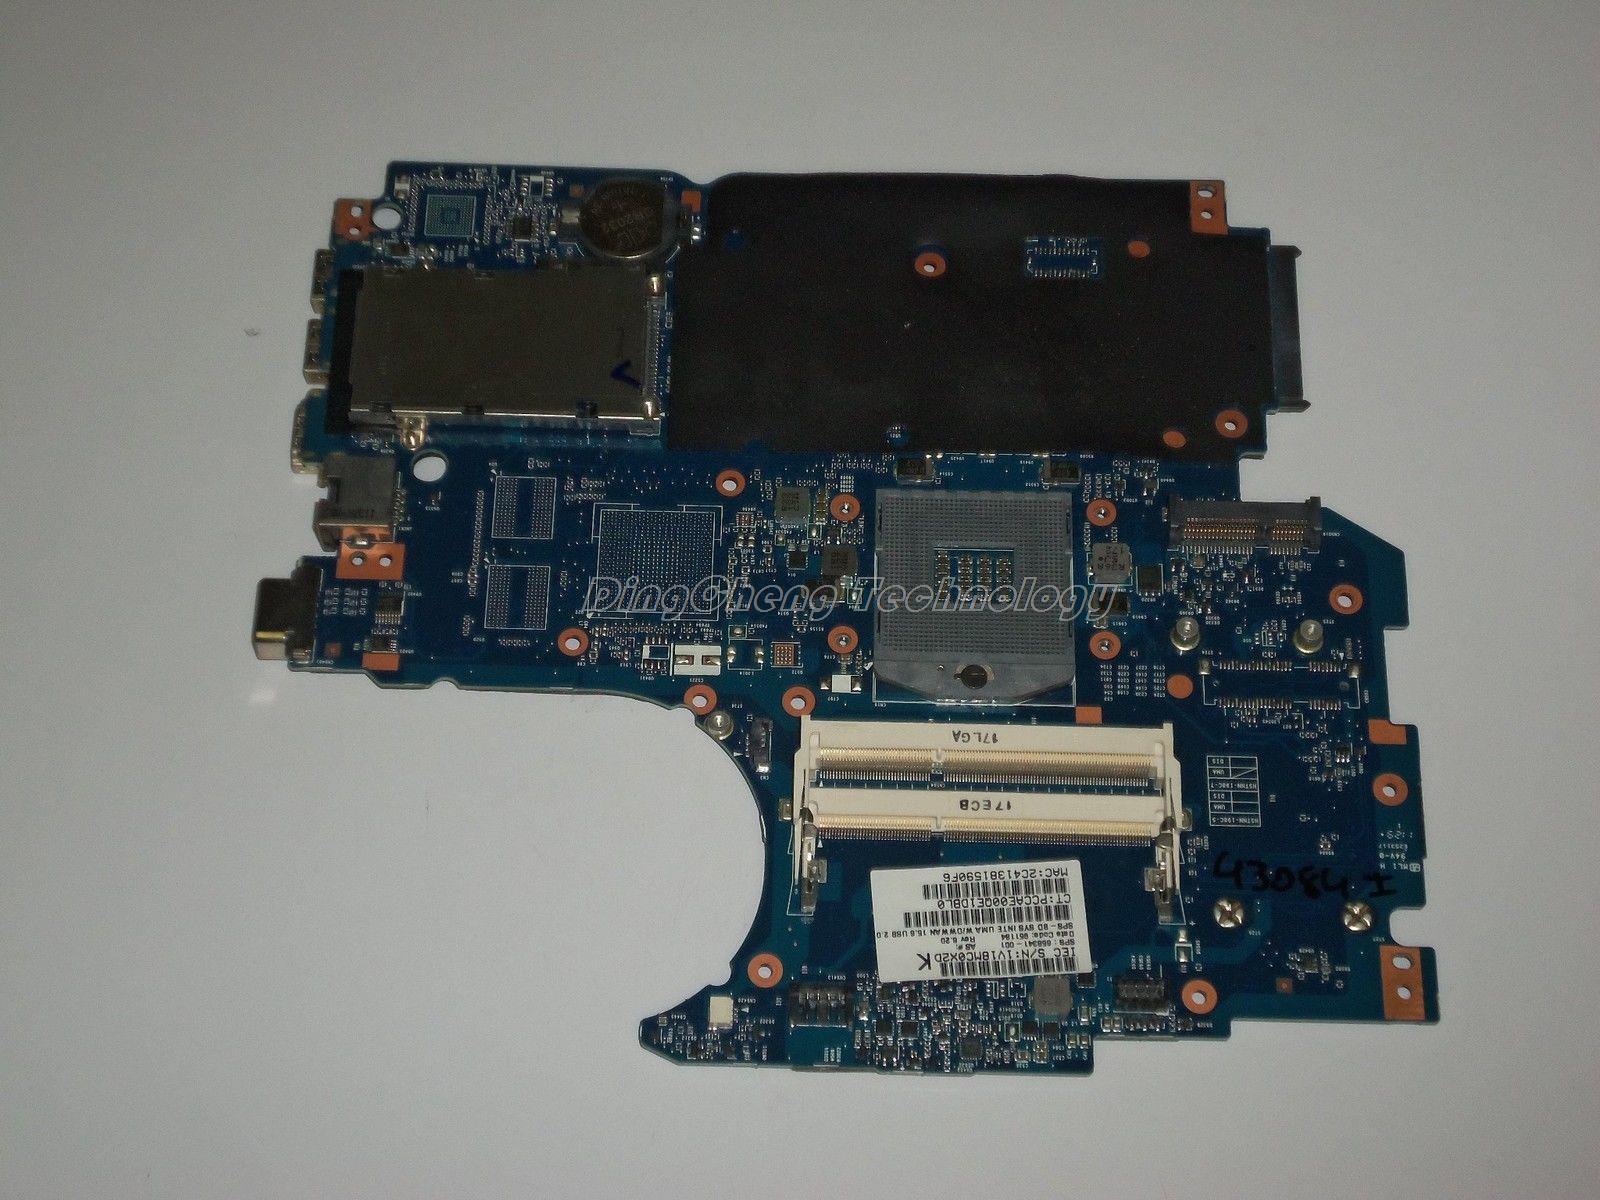 For HP 4530S 4730S 658341-001 Original laptop Motherboard for intel cpu with HM65 integrated graphic card DDR3 100% tested fully аэратор д смесителя remer m24 с нерж сеточкой